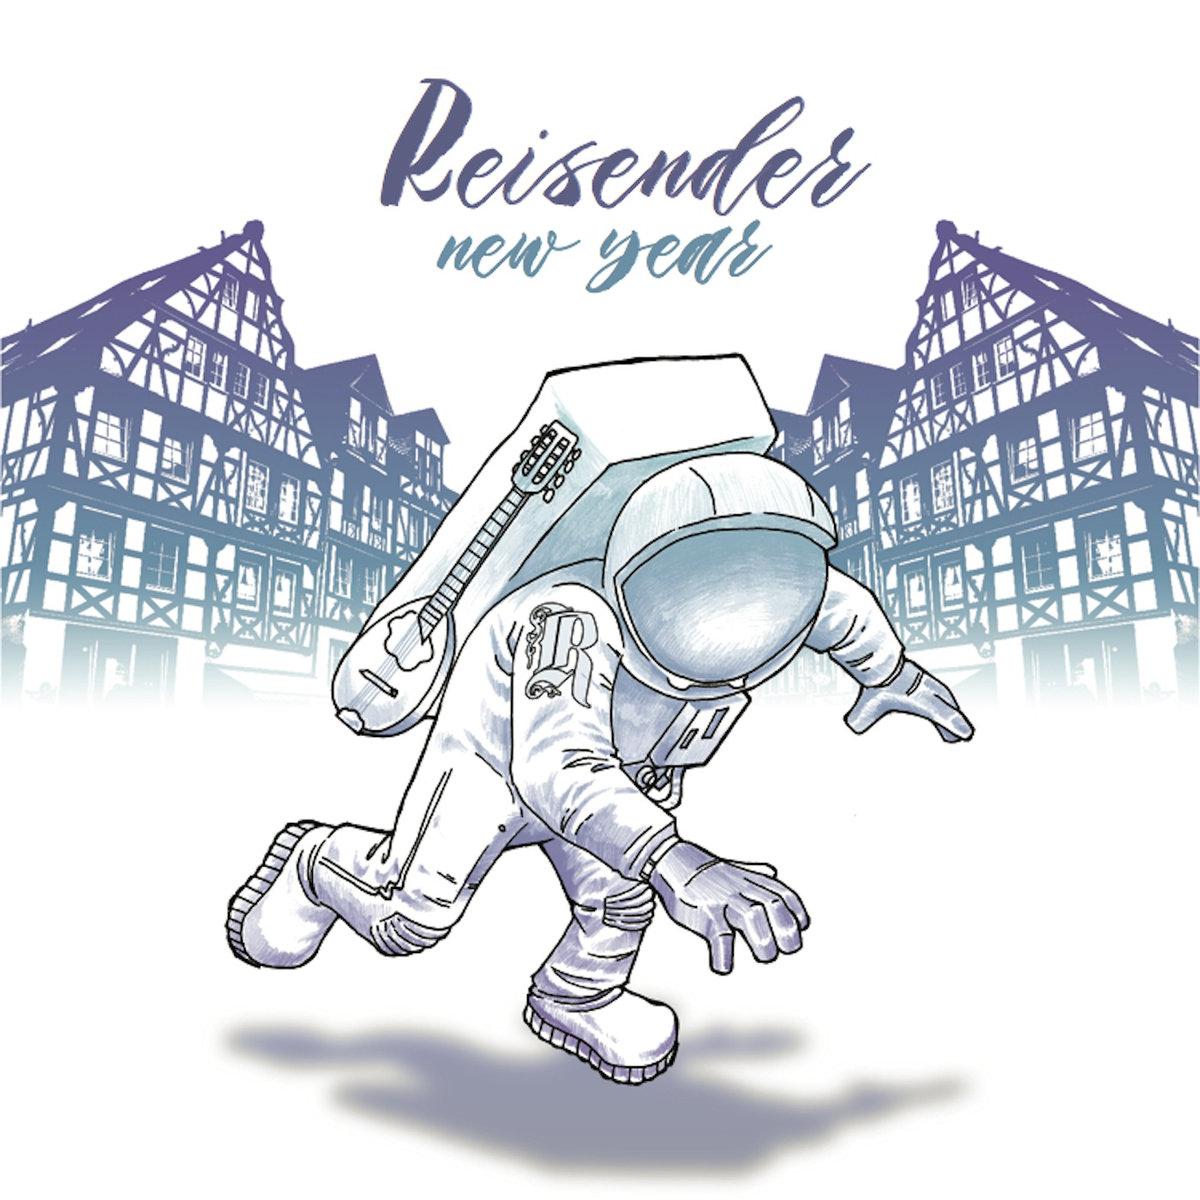 Reisender - New year